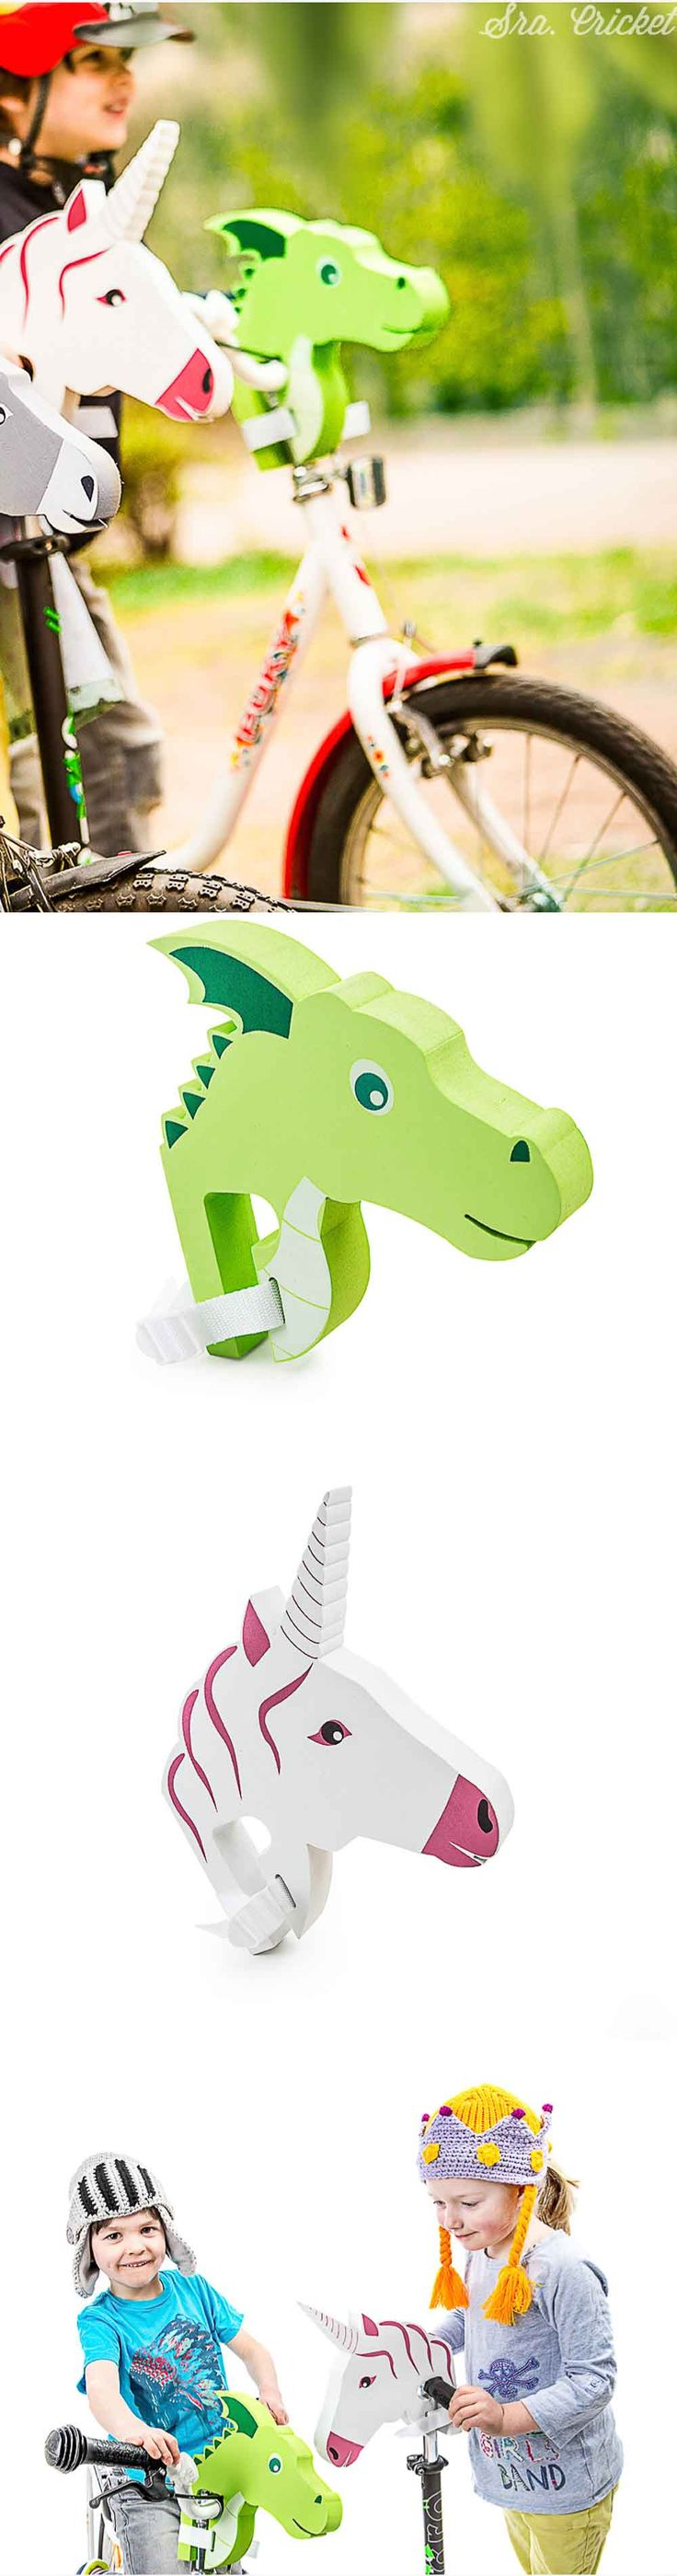 accesorio para bicicleta, accesorio para patinete #regalosparaniños Regalo para niños ideal #dragon #unicornio juguete